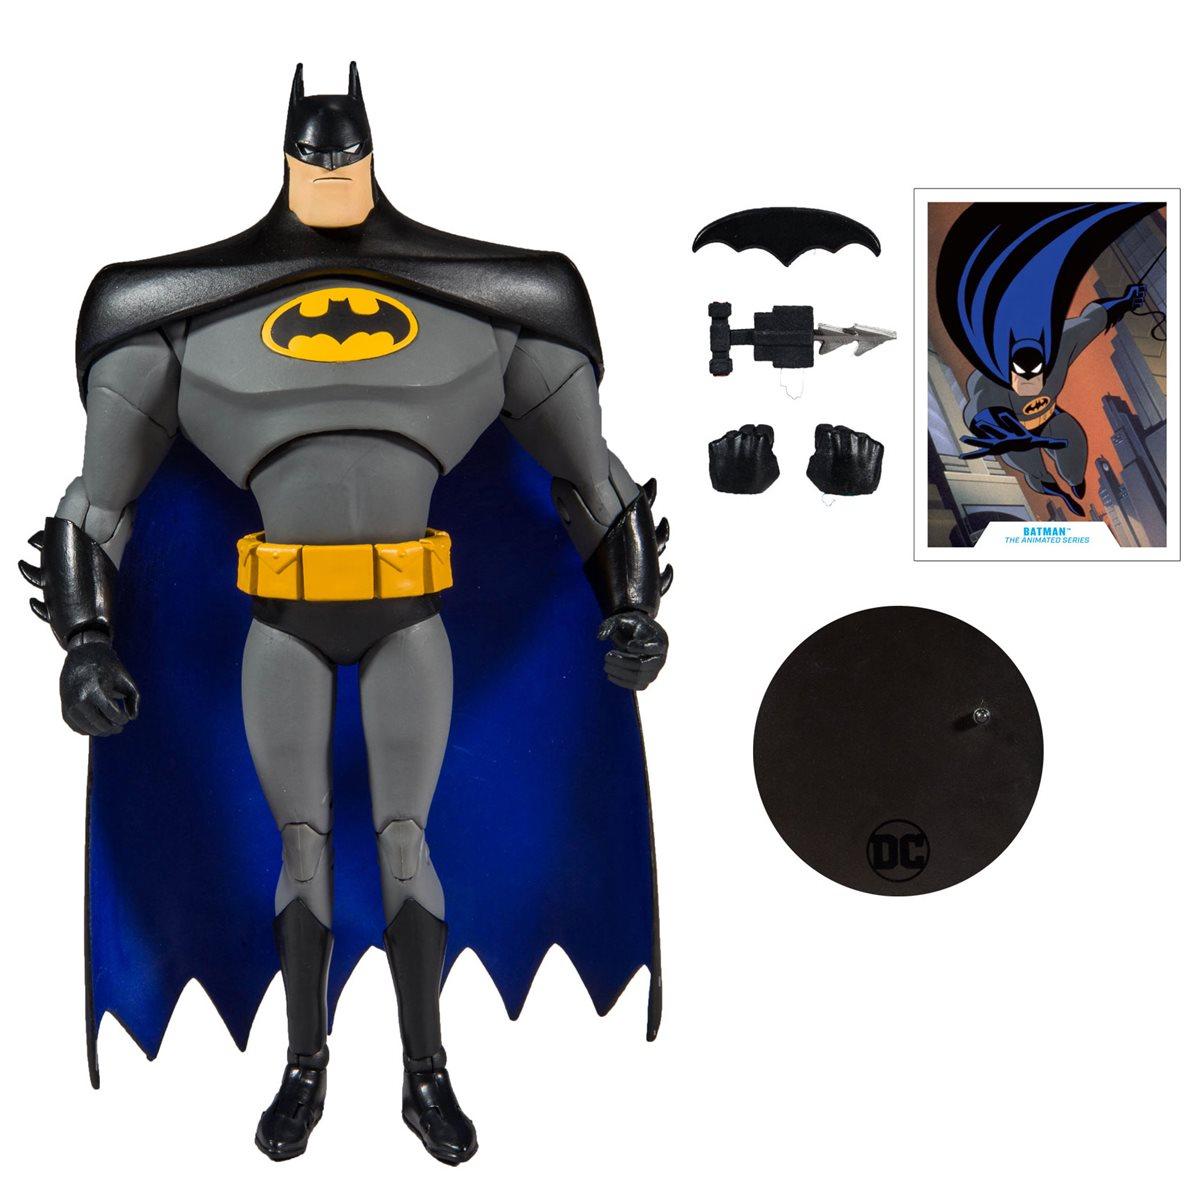 Various Batman Action Figures Opened